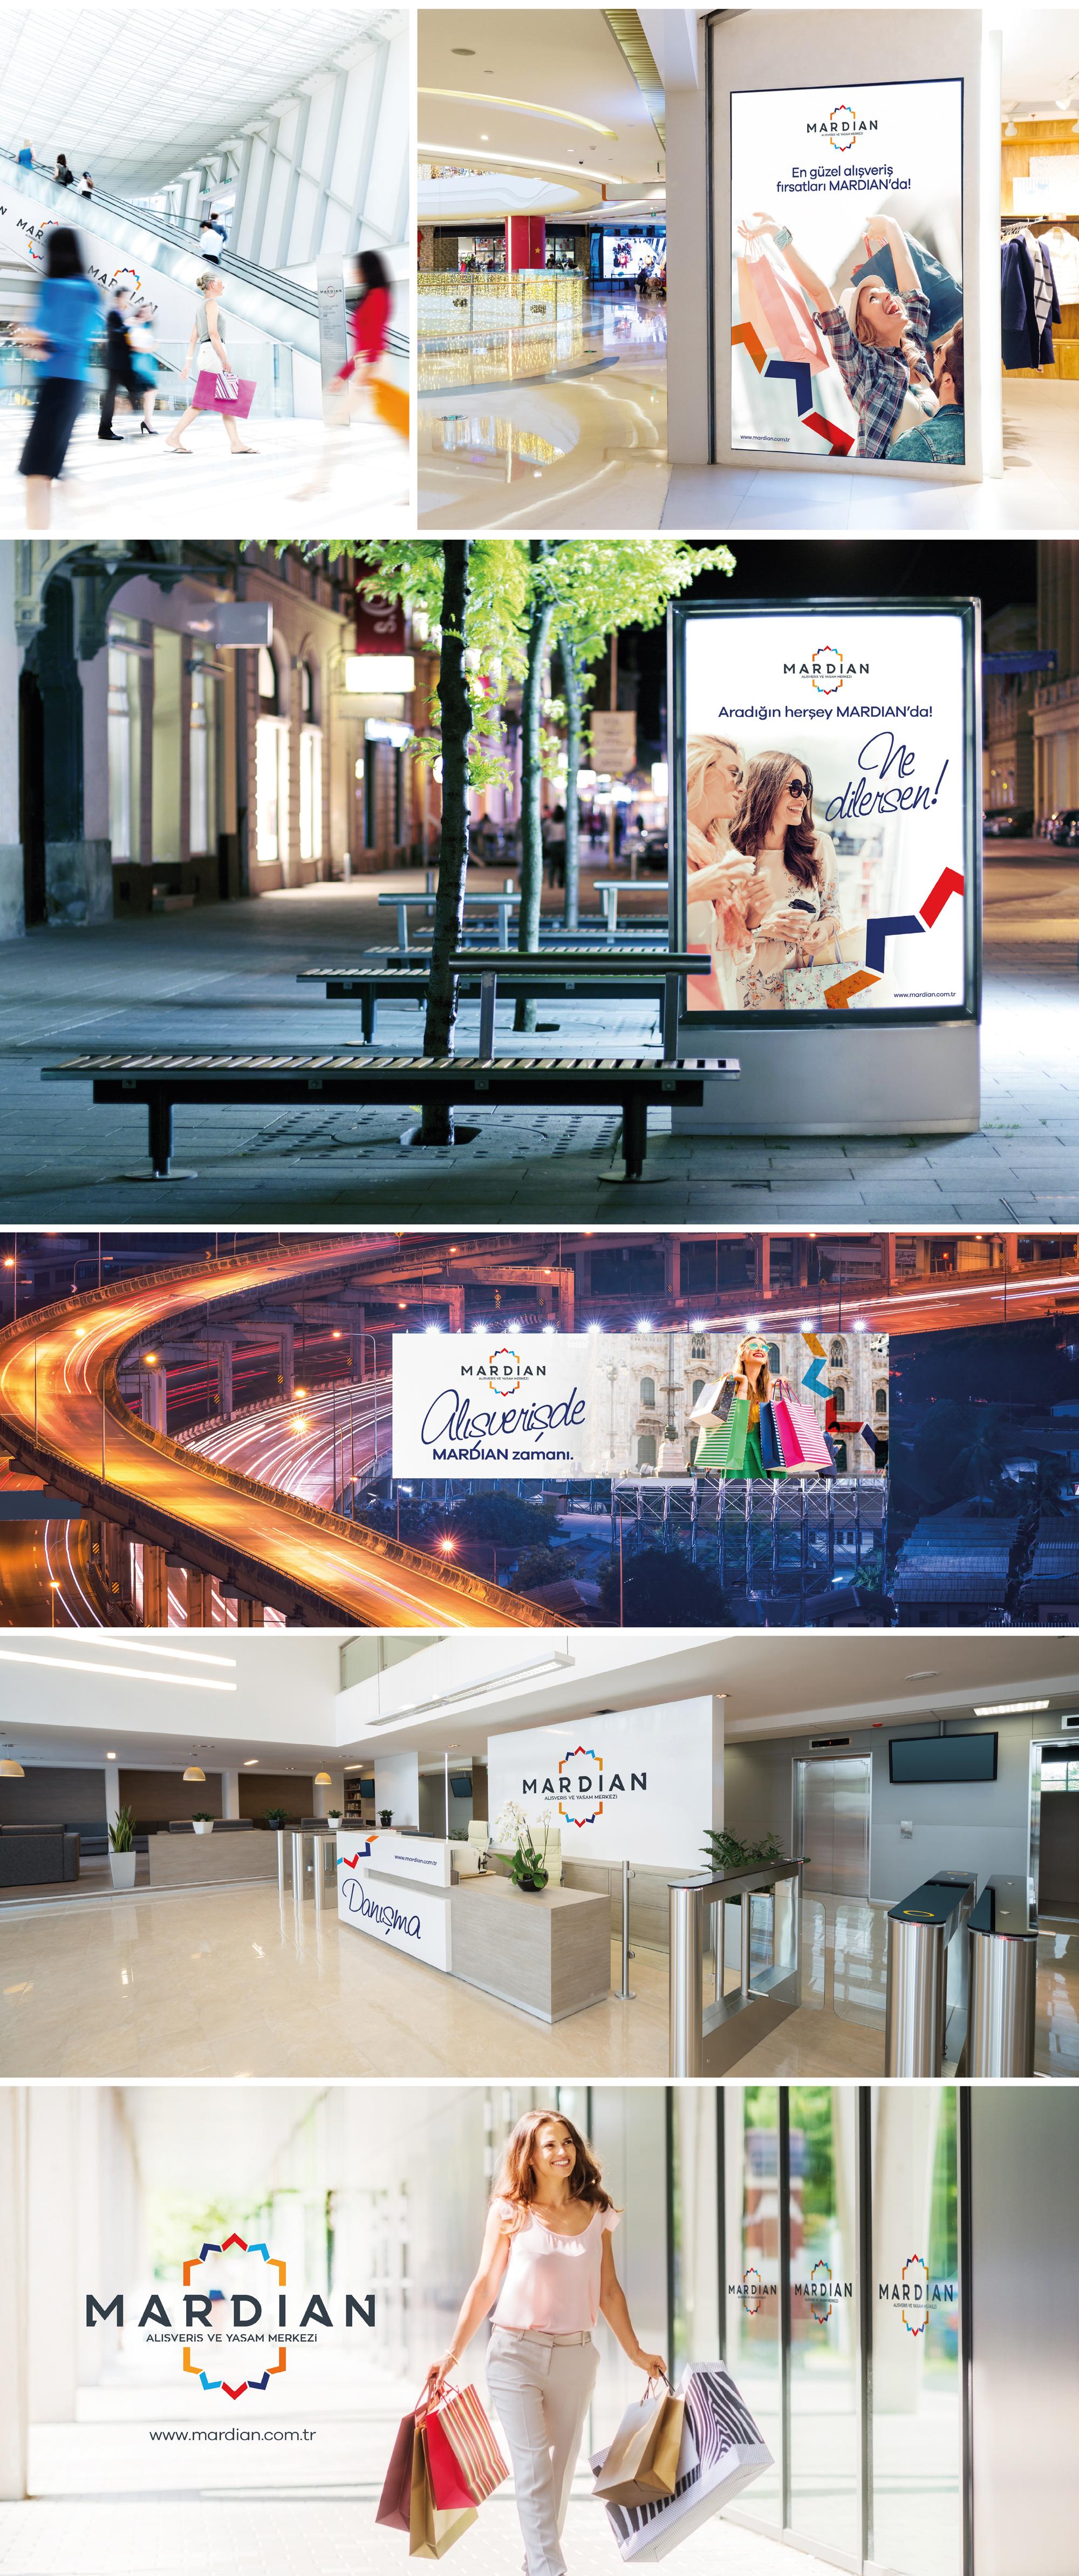 Ankara kurumsal kimlik tasarımı  Mardian Mall